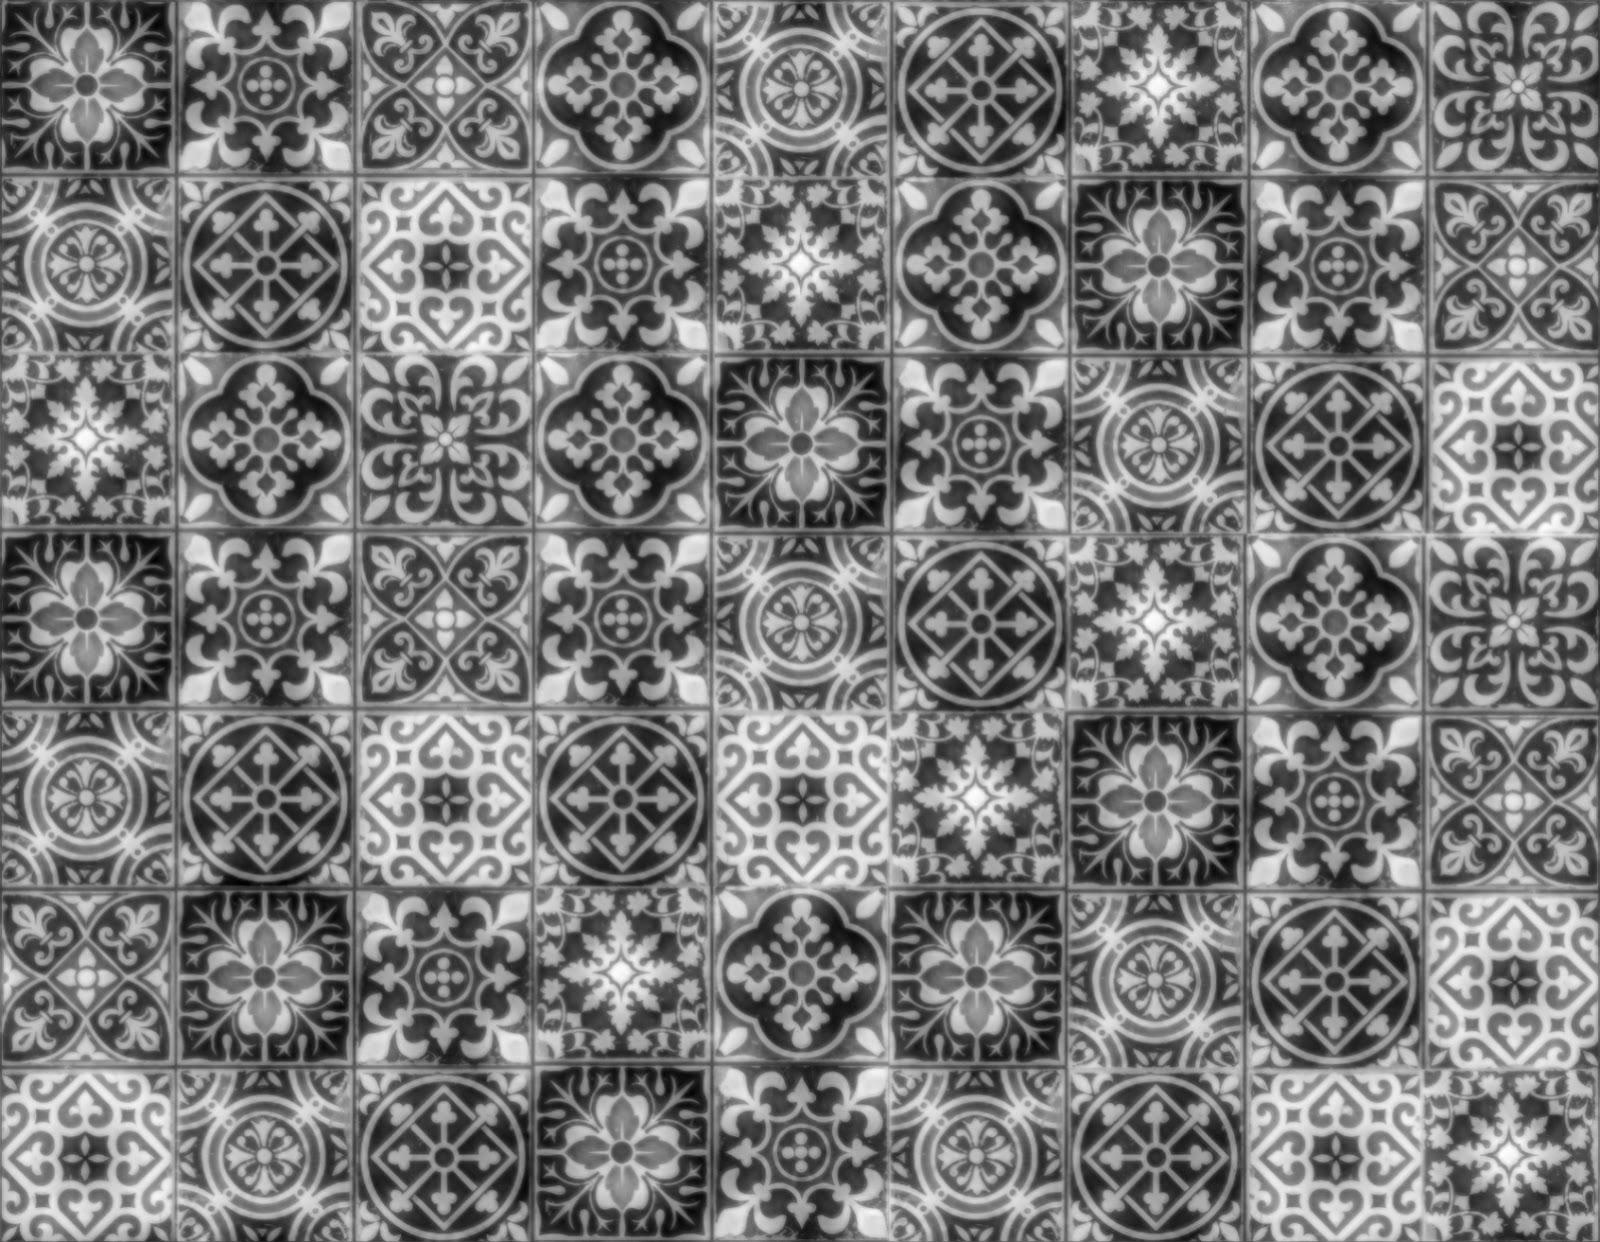 Seamless Patchwork Tiles Texture Texturise Free Seamless